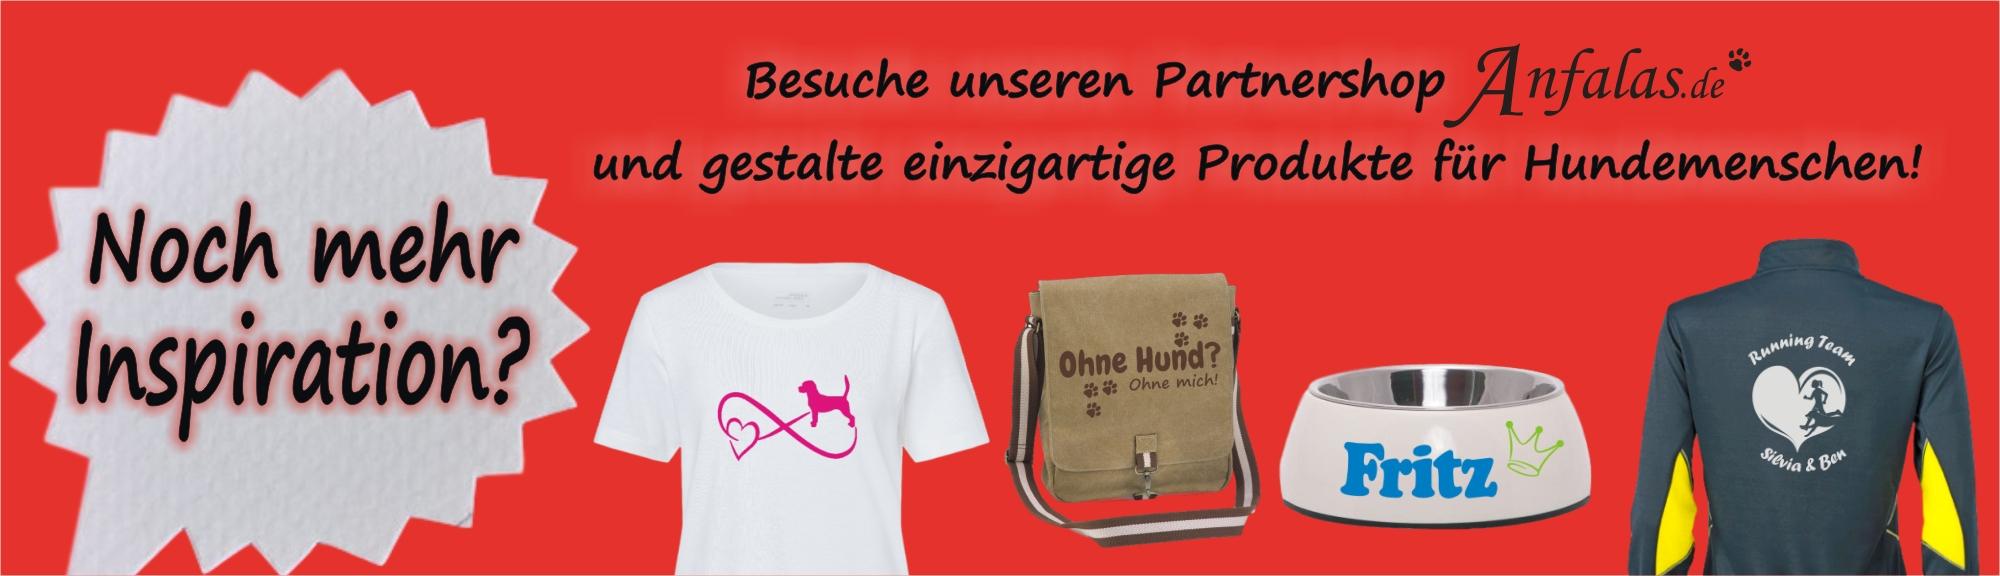 Link zu Anfalas.de